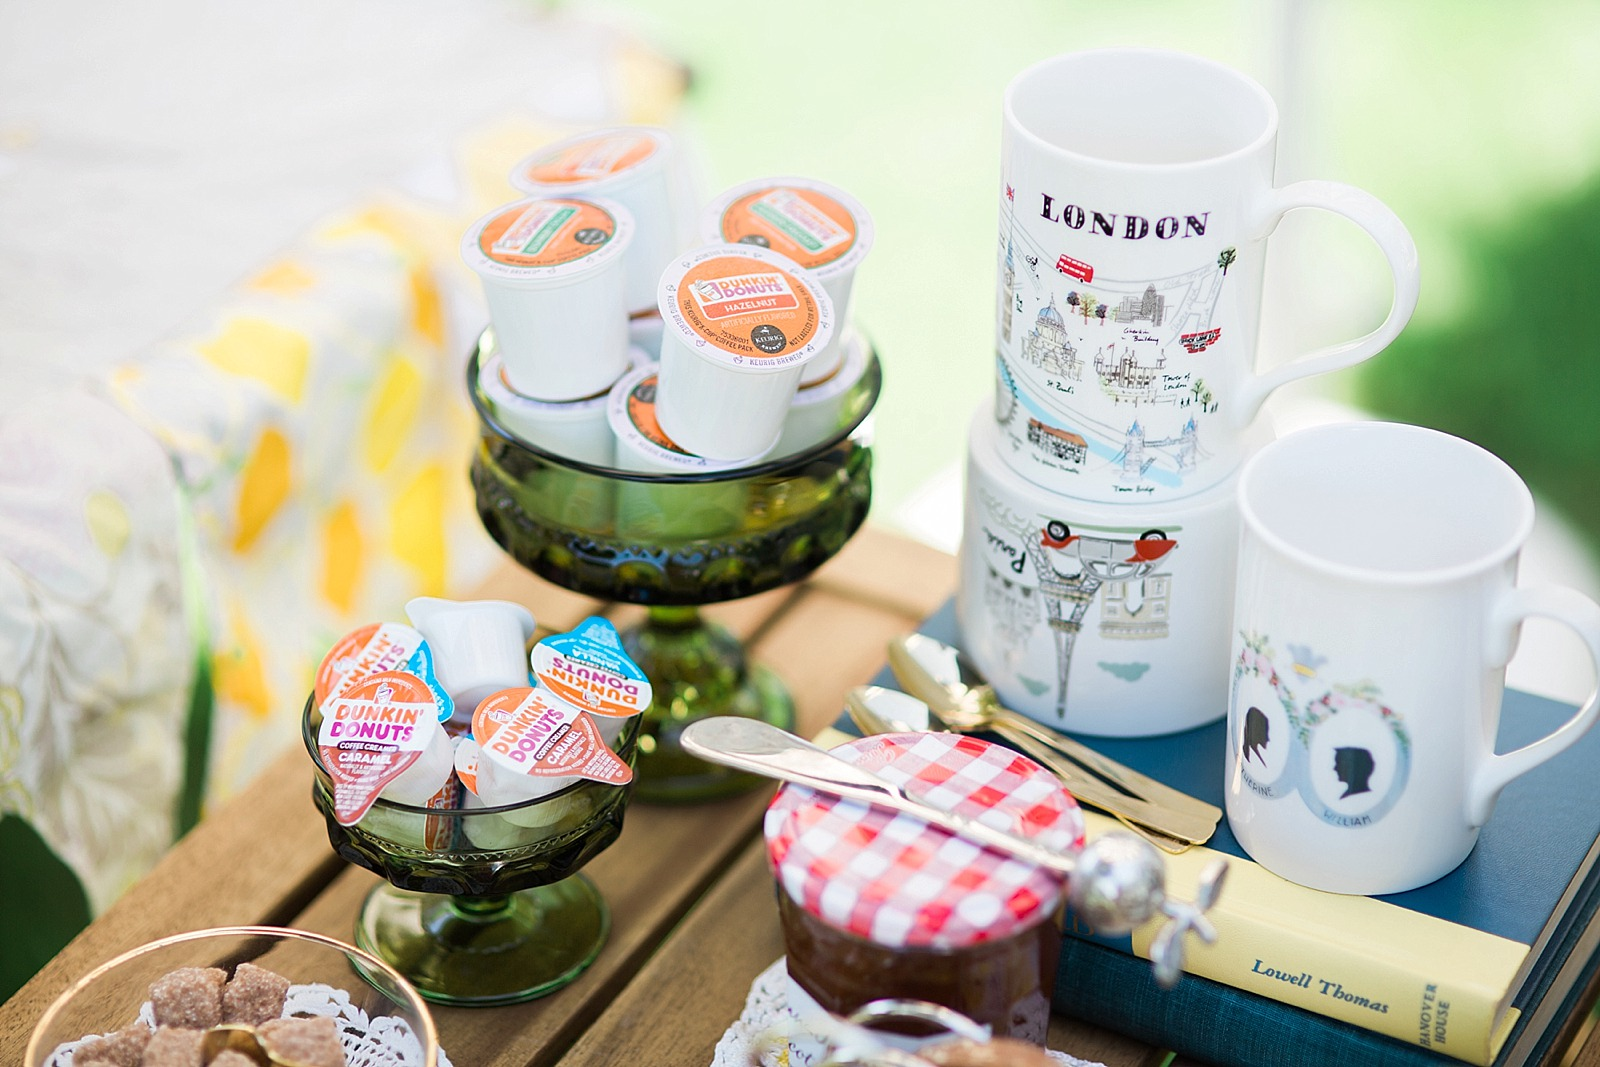 diana-elizabeth-blog-lifestyle-dunkin-creamers-dunkin-donuts-brunch-book-club--4544